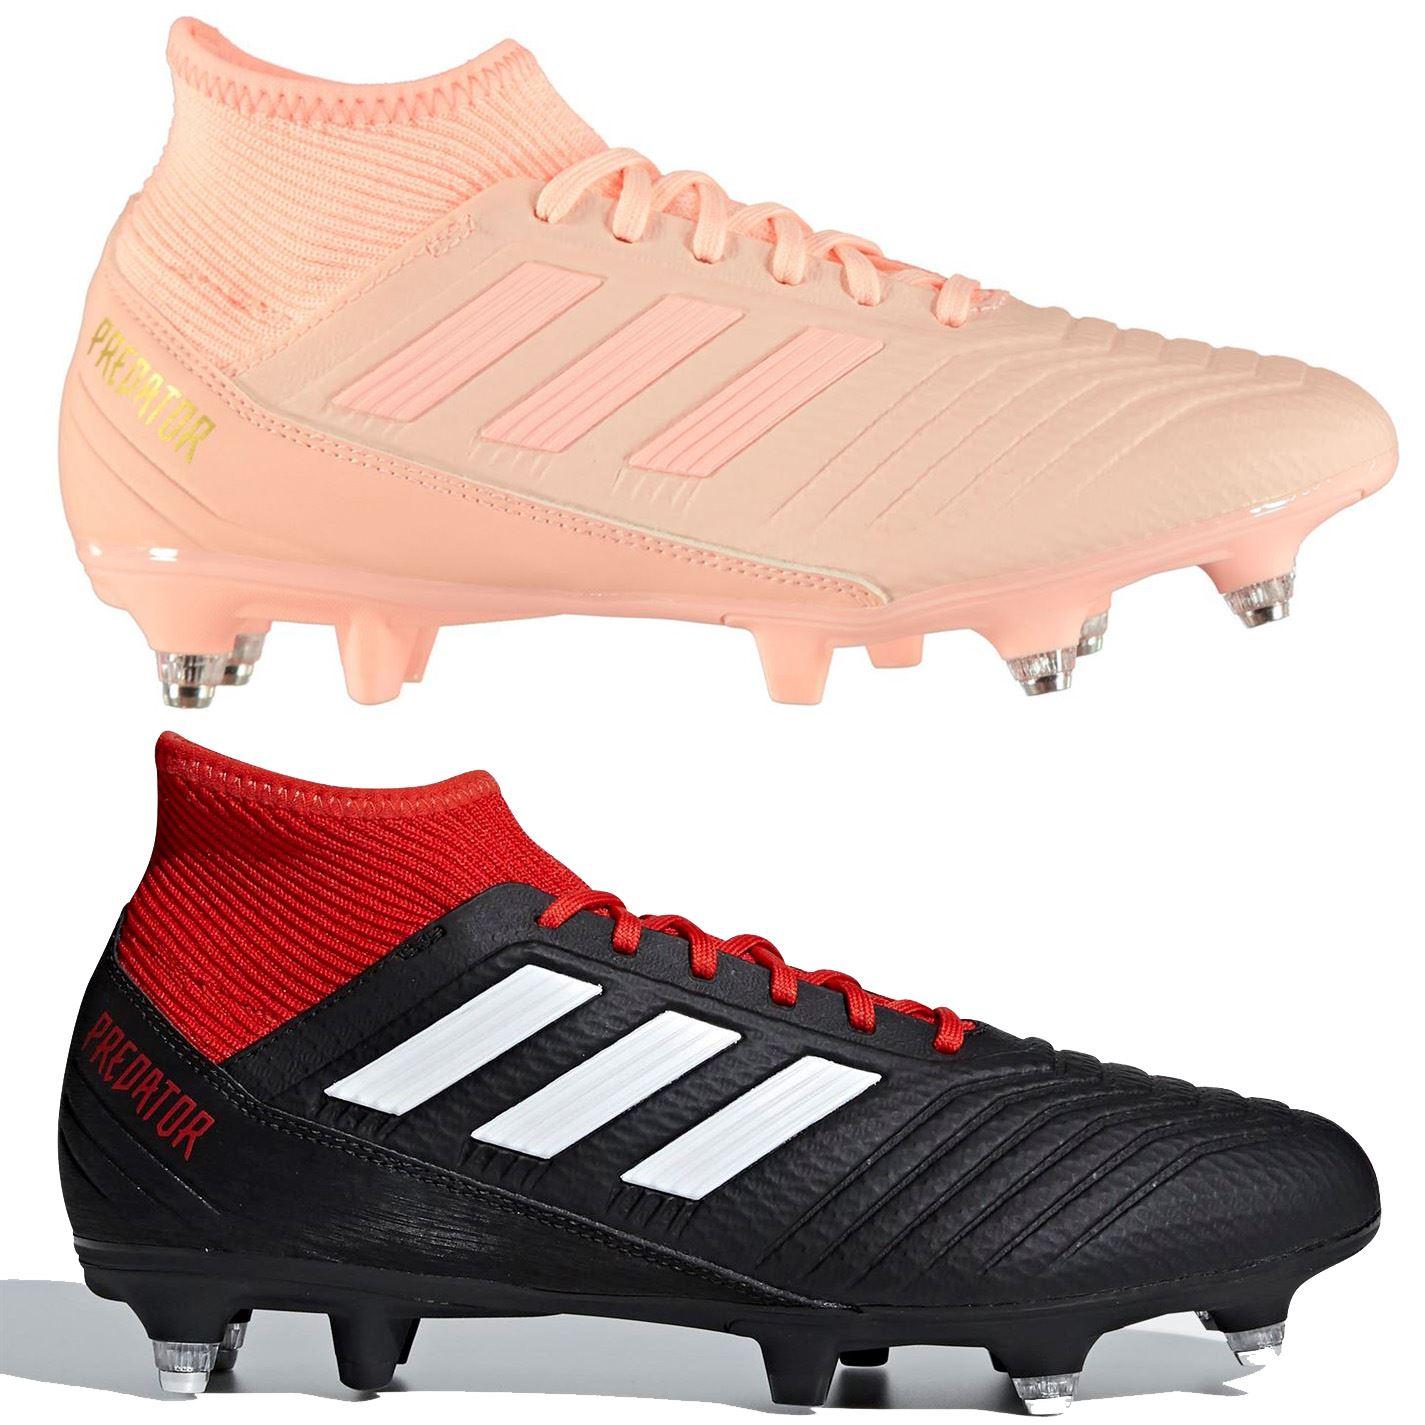 fbaa5da642 ... adidas predator 18.3 SG Soft Ground Football Boots Mens Soccer Shoes  Cleats ...